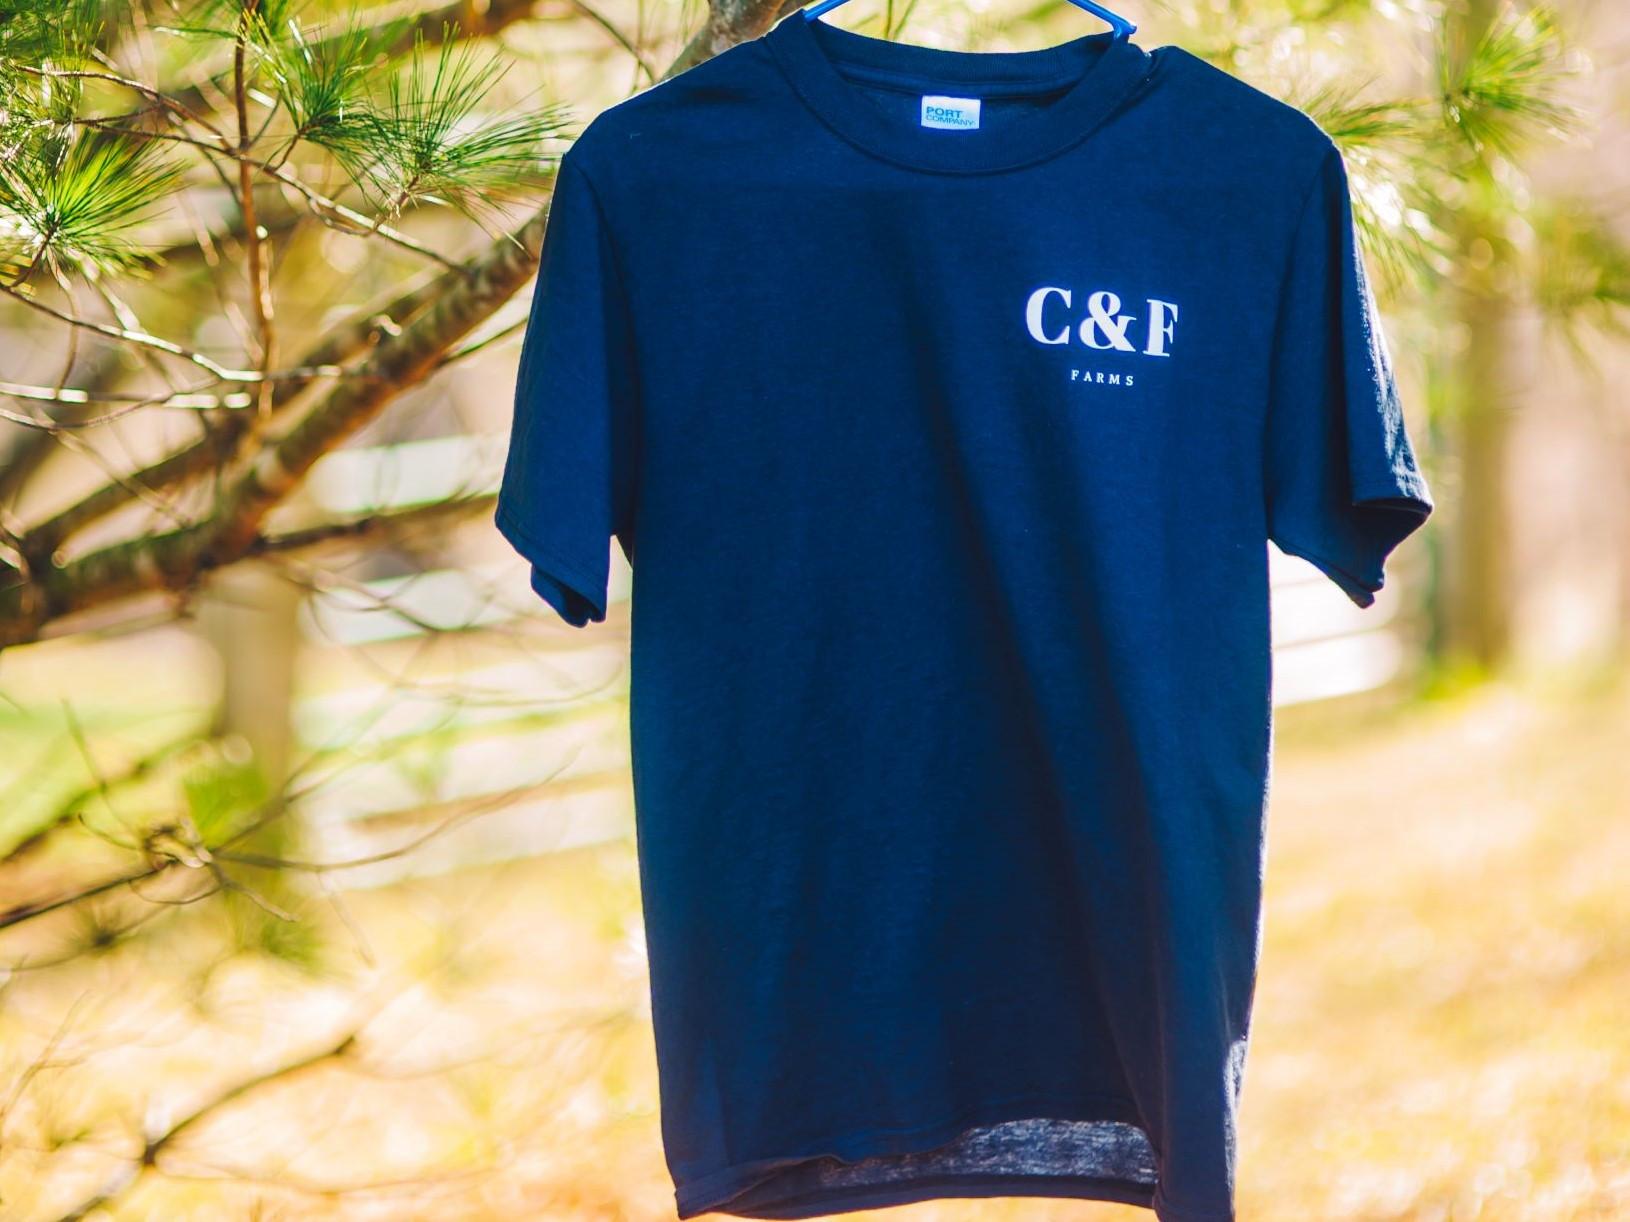 C&F Farms Short Sleeve T-Shirt